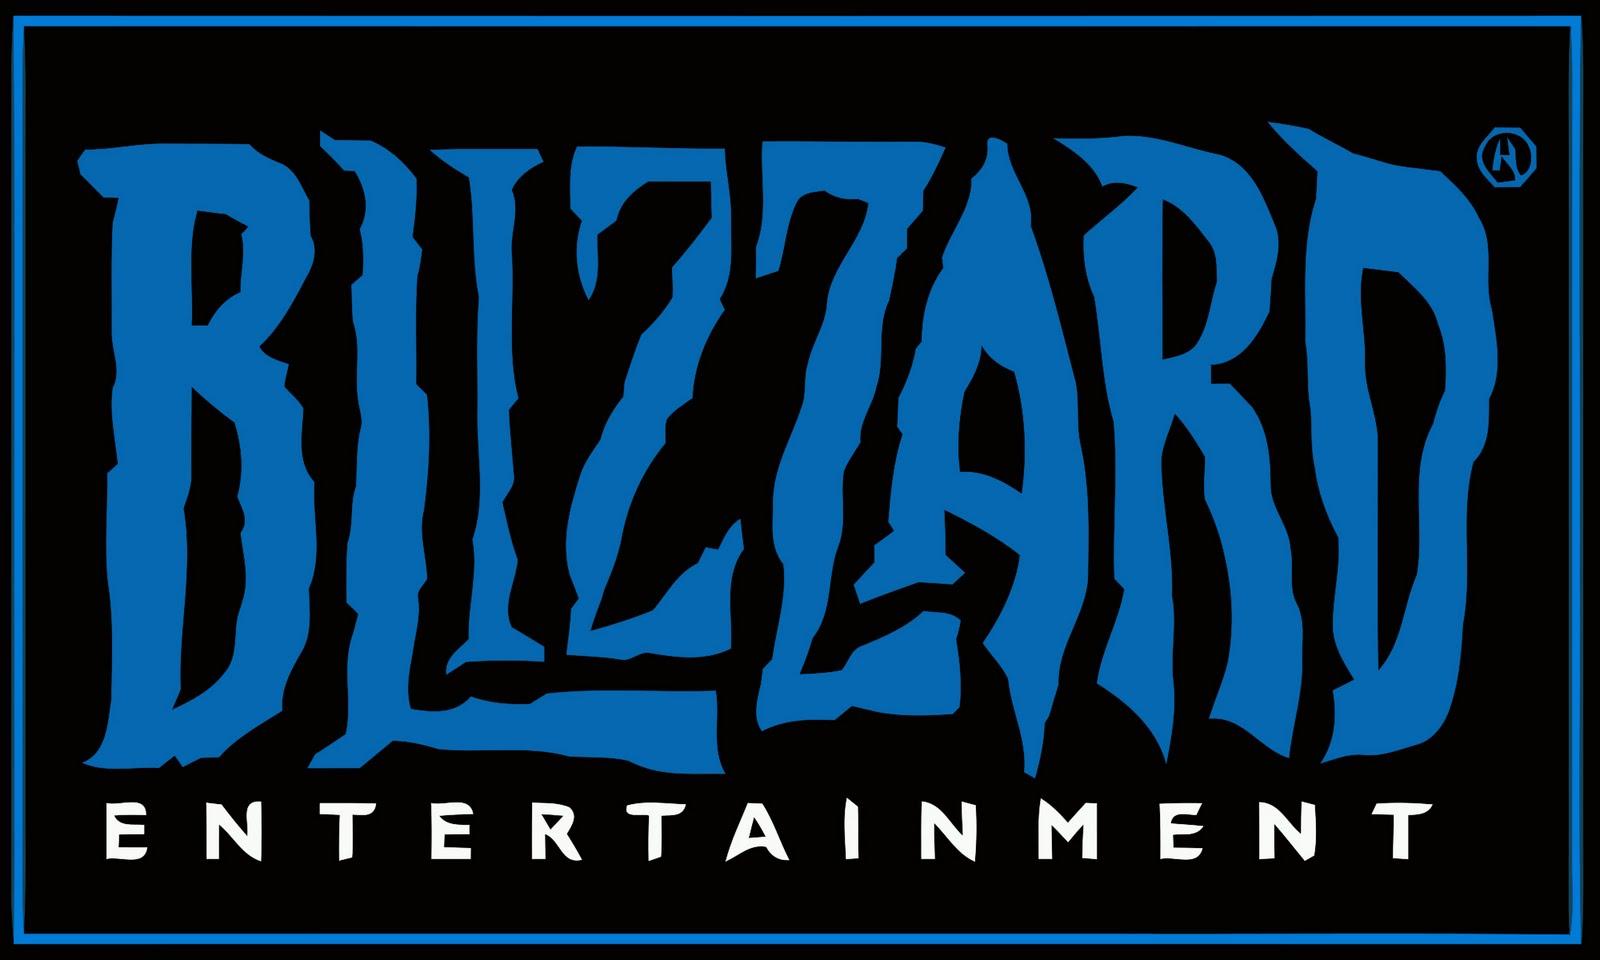 Blizzard Entertainment Logo HD Wallpaper 1600x960